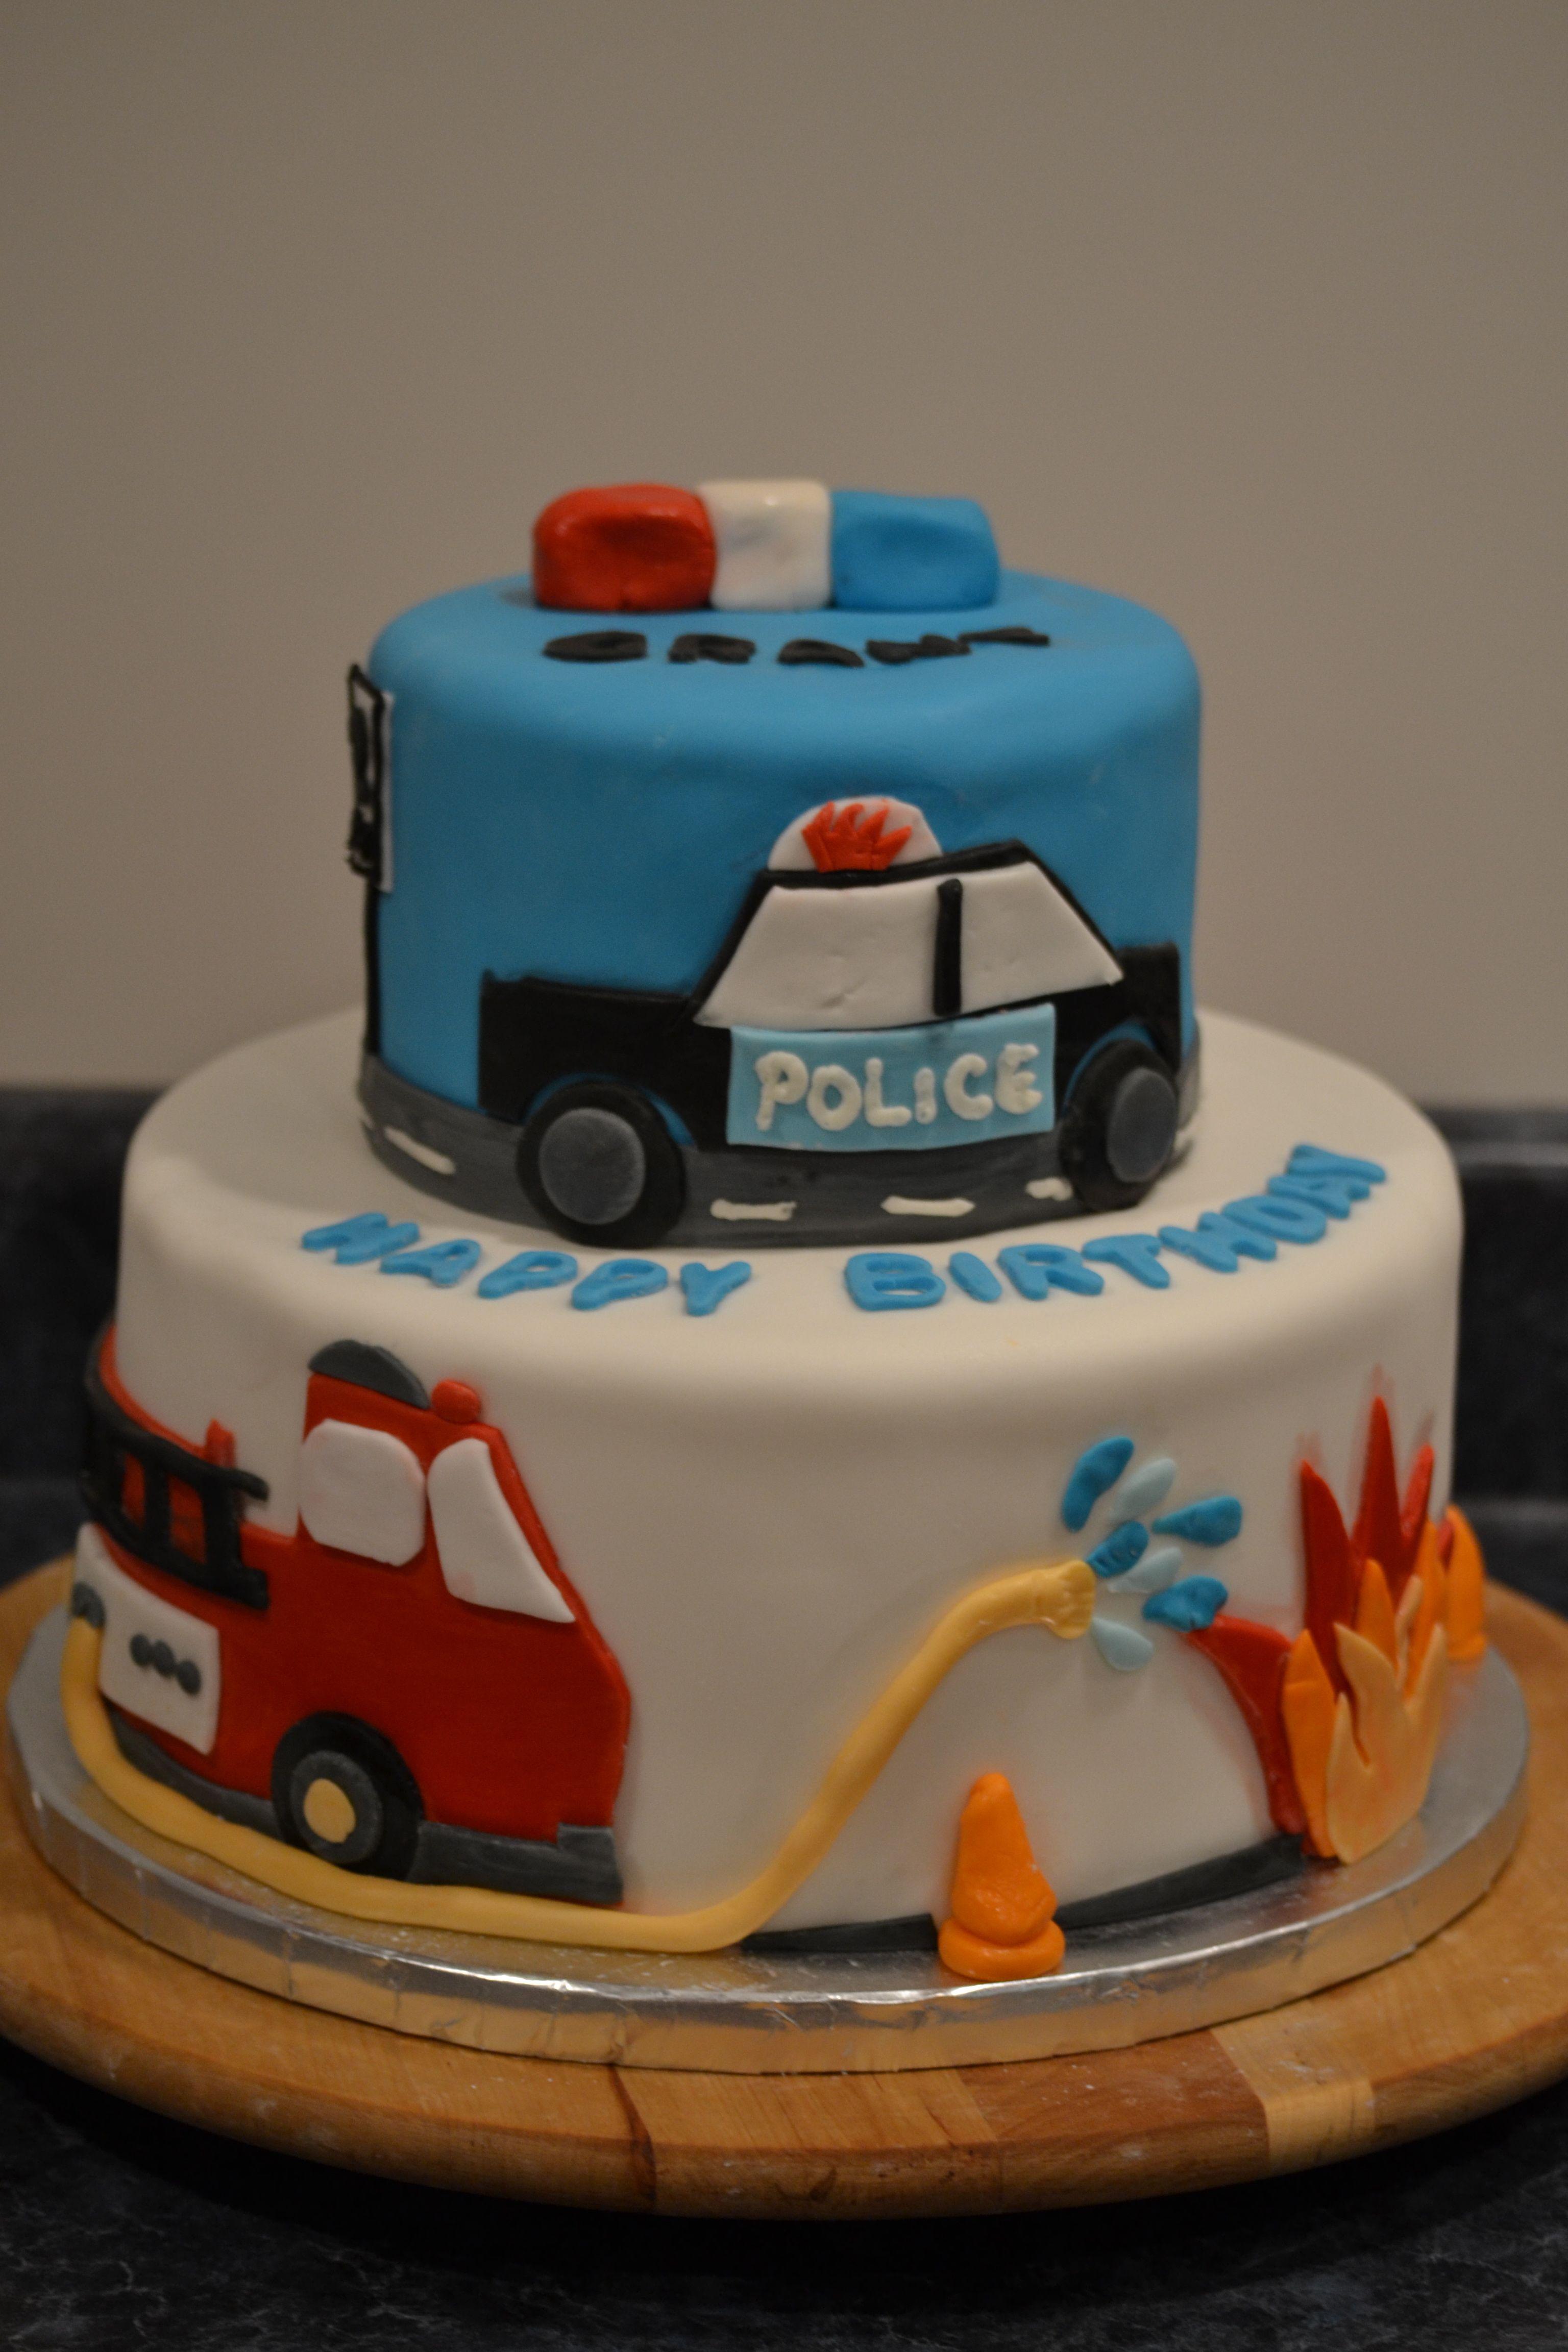 Fire police car cake cakes by suzanne modlowski